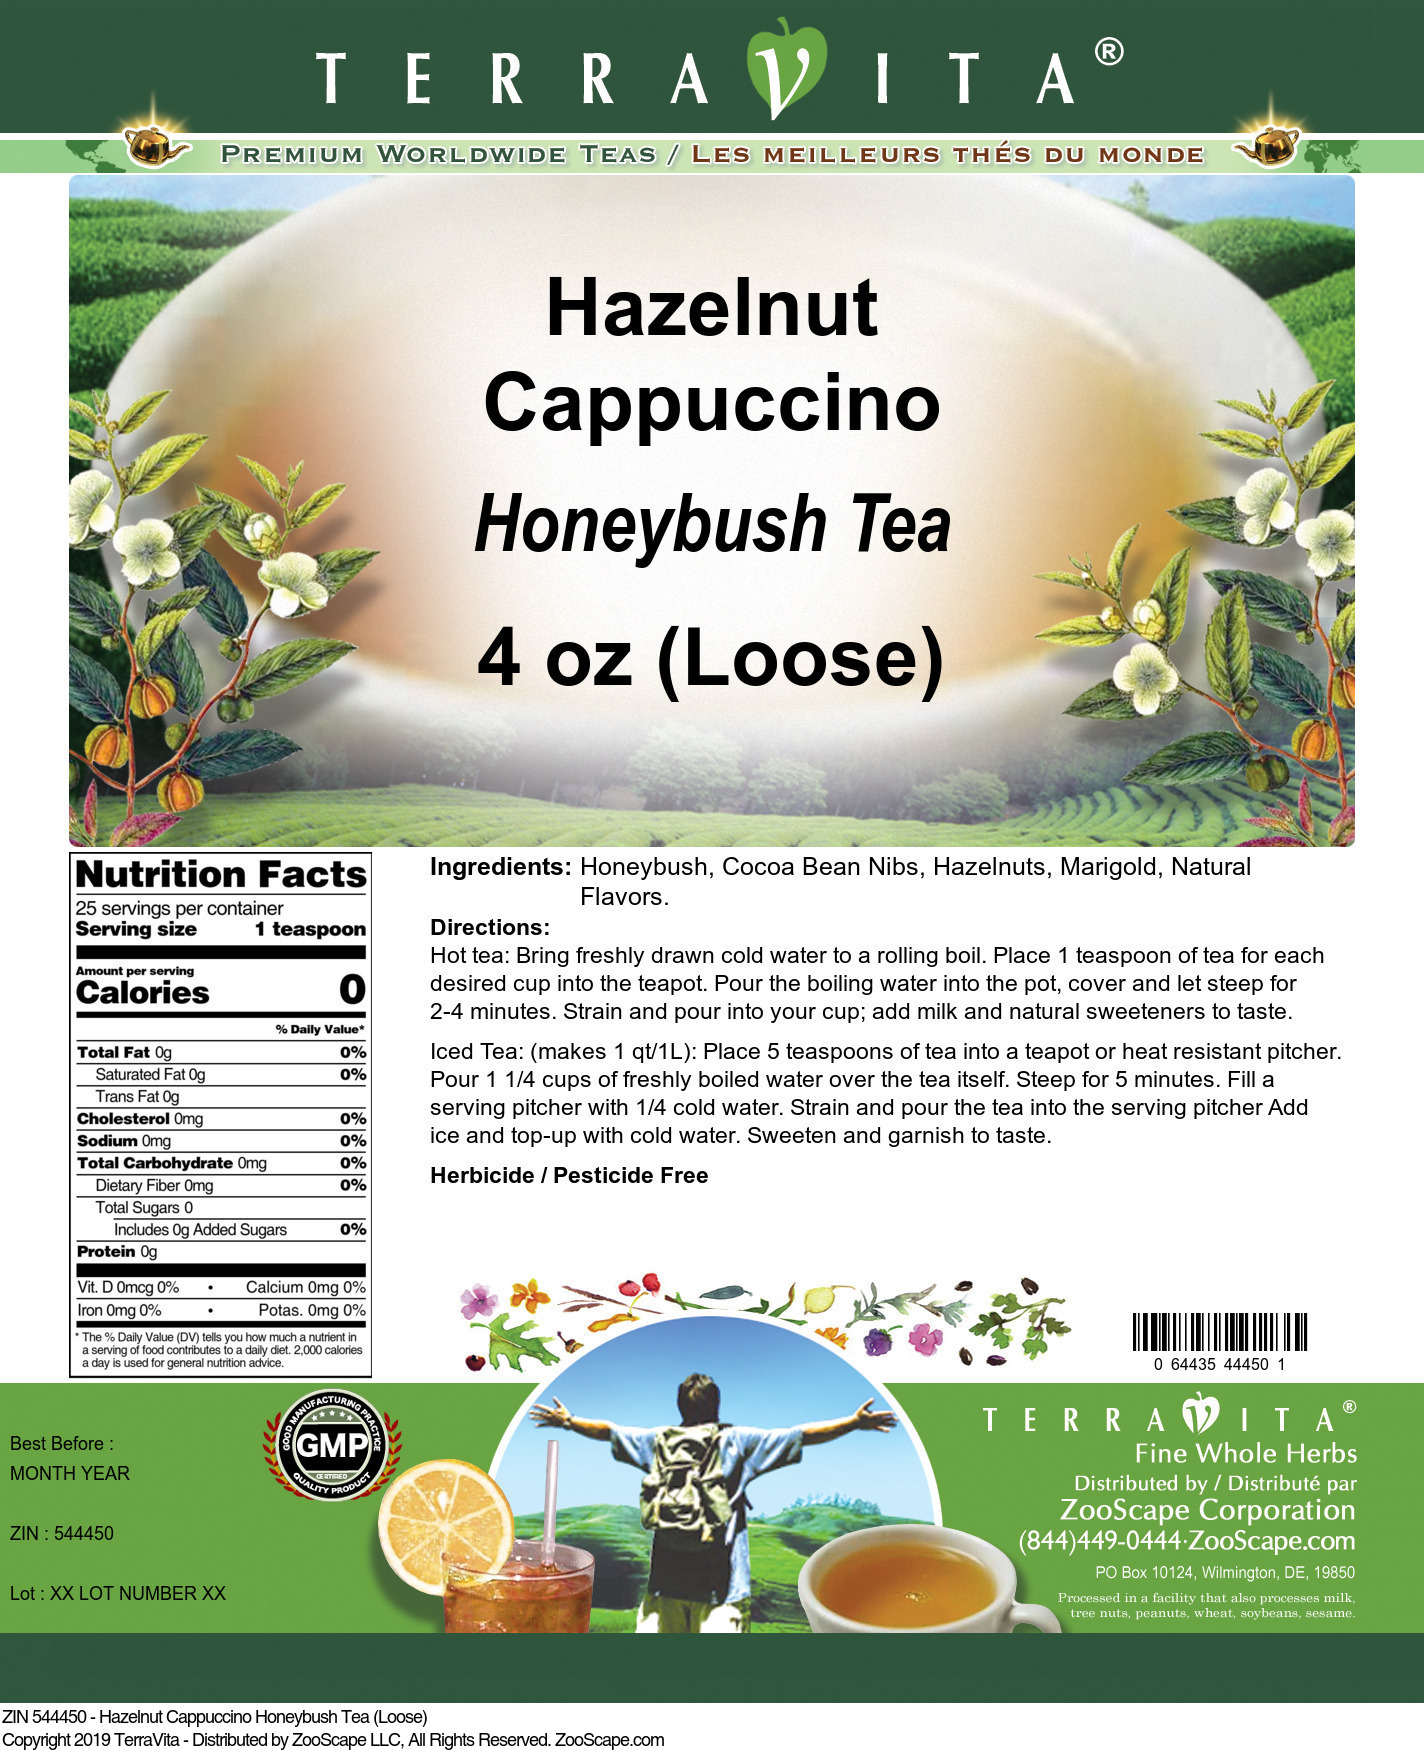 Hazelnut Cappuccino Honeybush Tea (Loose)